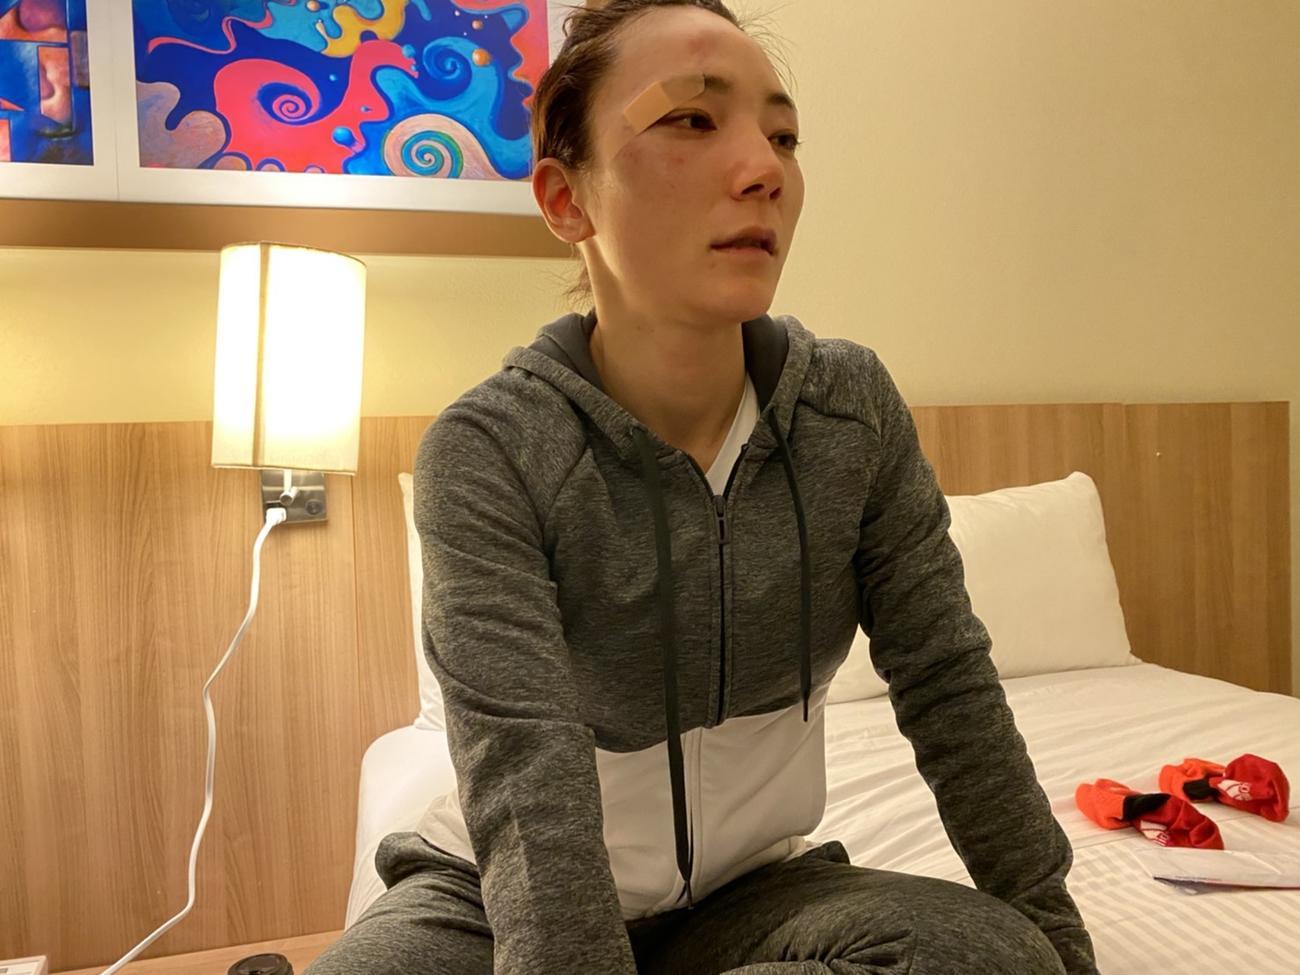 IBF女子世界ミニマム級王者バジェに判定負けを喫し、葉月は悔しそうな表情(写真提供:YuKOフィットネスボクシングジム)